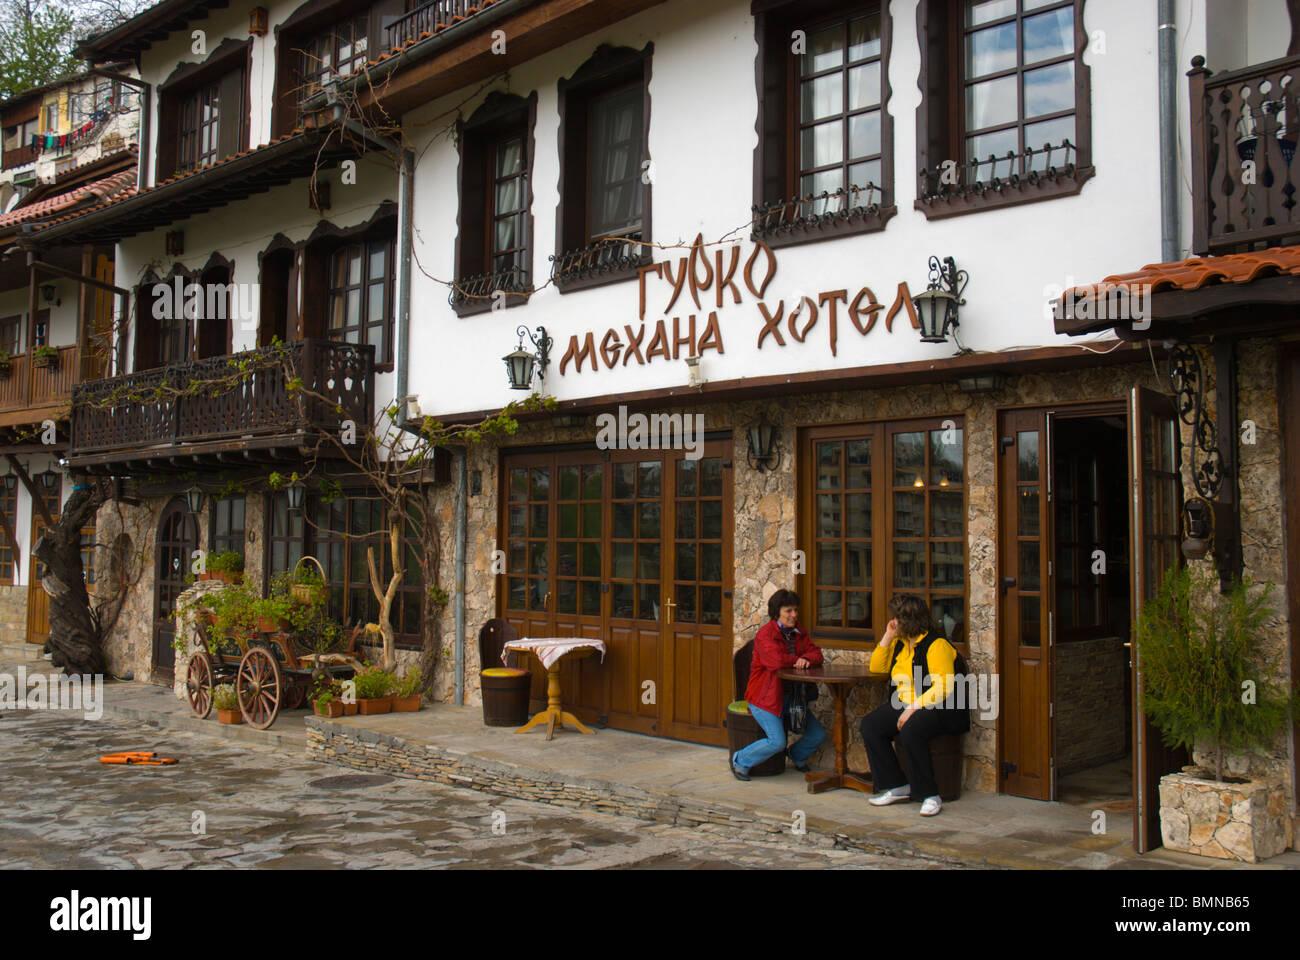 Mehana typical Bulgarian restaurant old town Veliko Tarnovo central Bulgaria Balkans Europe Stock Photo